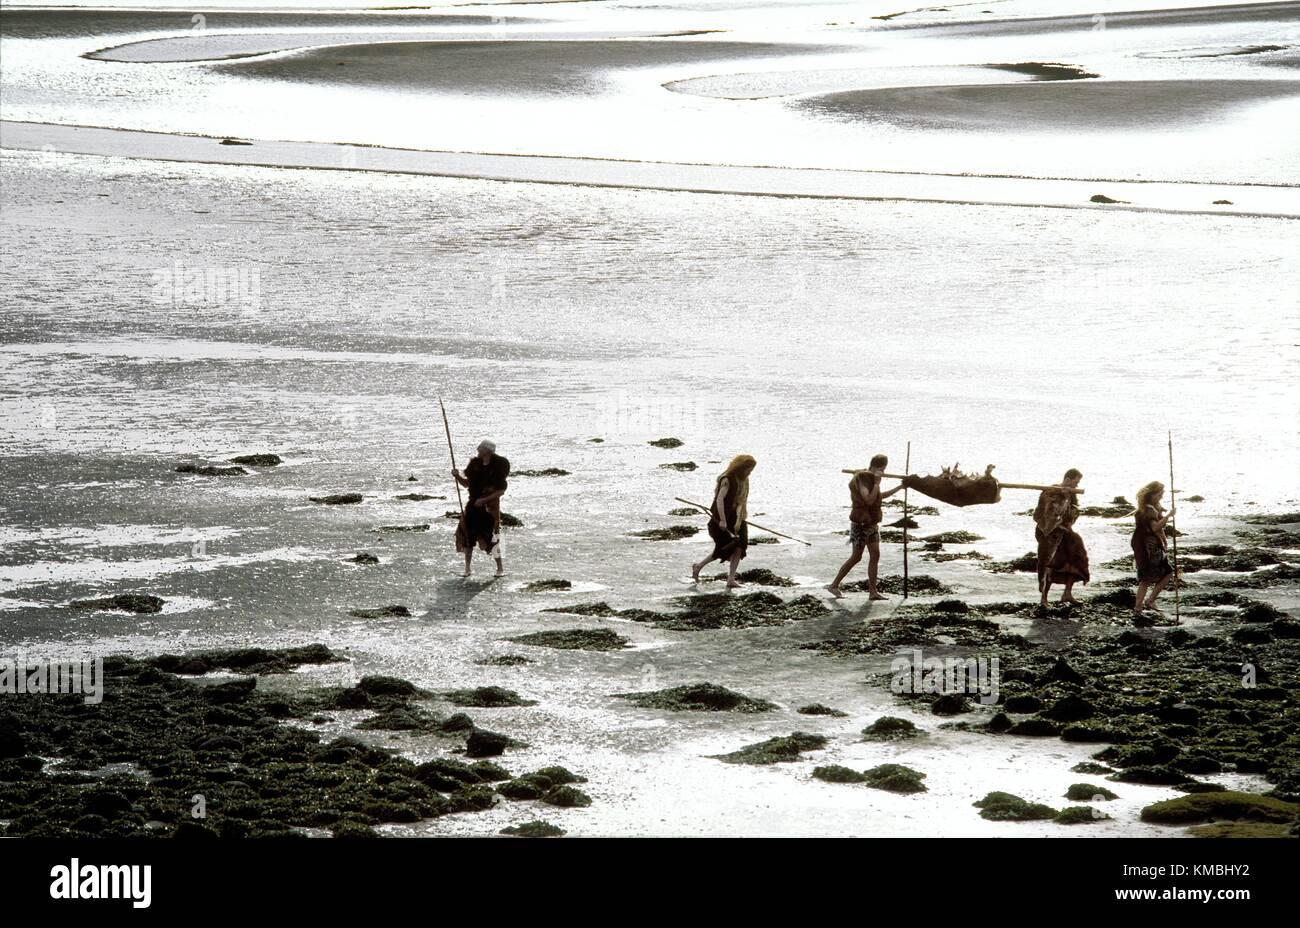 Neolithic prehistoric cave men caveman cavemen cave man walking on mud flat tidal estuary carrying deer food carcass - Stock Image